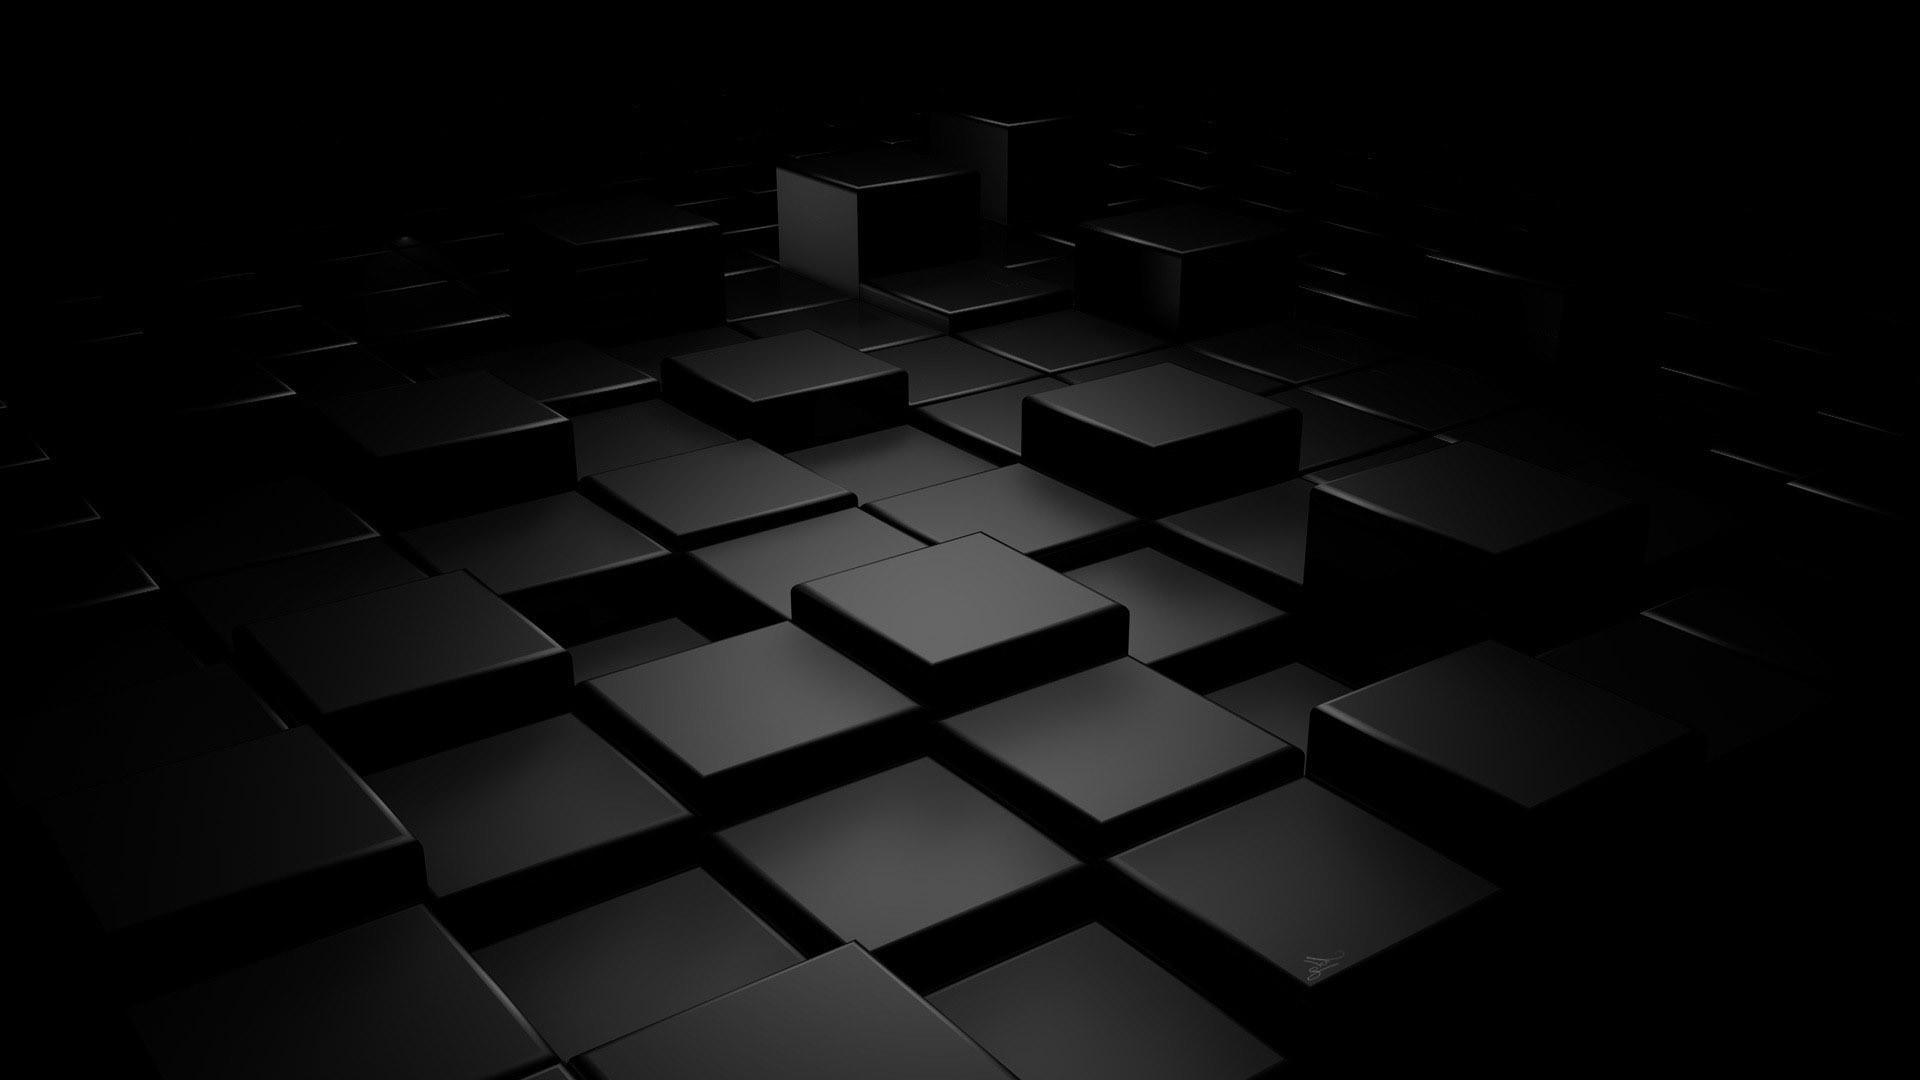 Black Abstract Wallpapers Desktop Background As Wallpaper HD